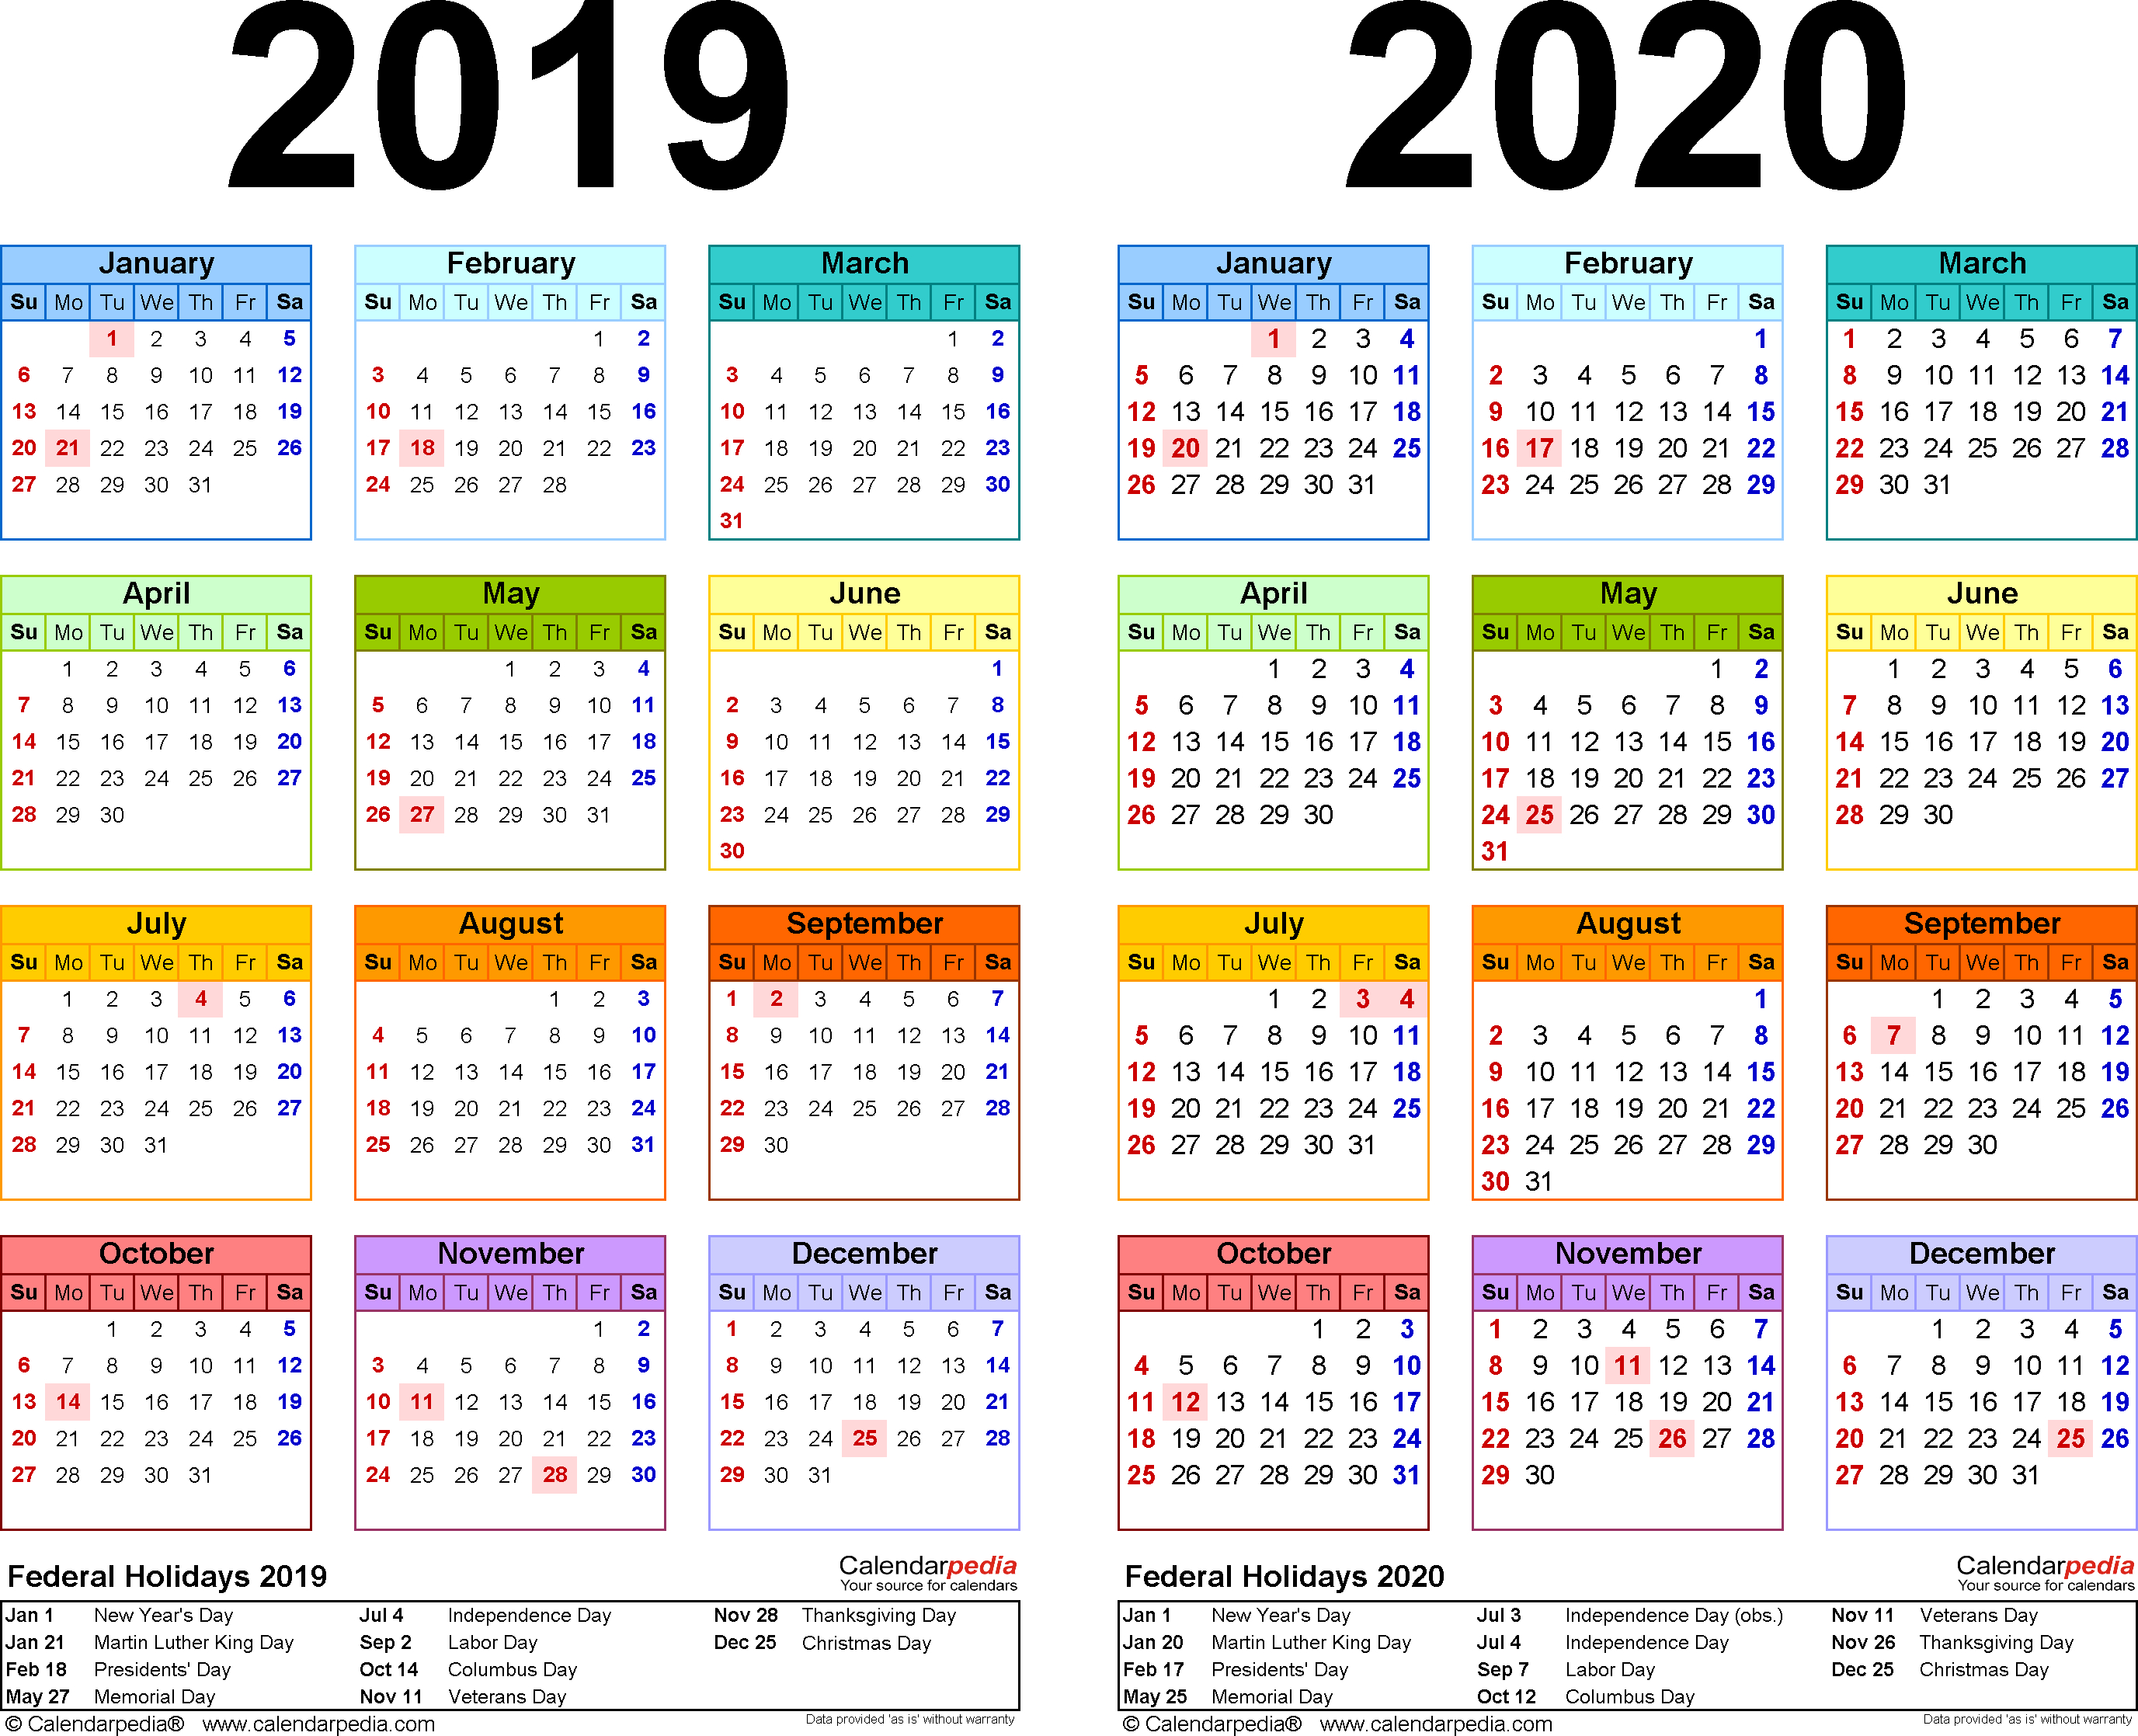 2019-2020 Calendar - Free Printable Two-Year Pdf Calendars in 2019-2020 Blank Calendar To Print